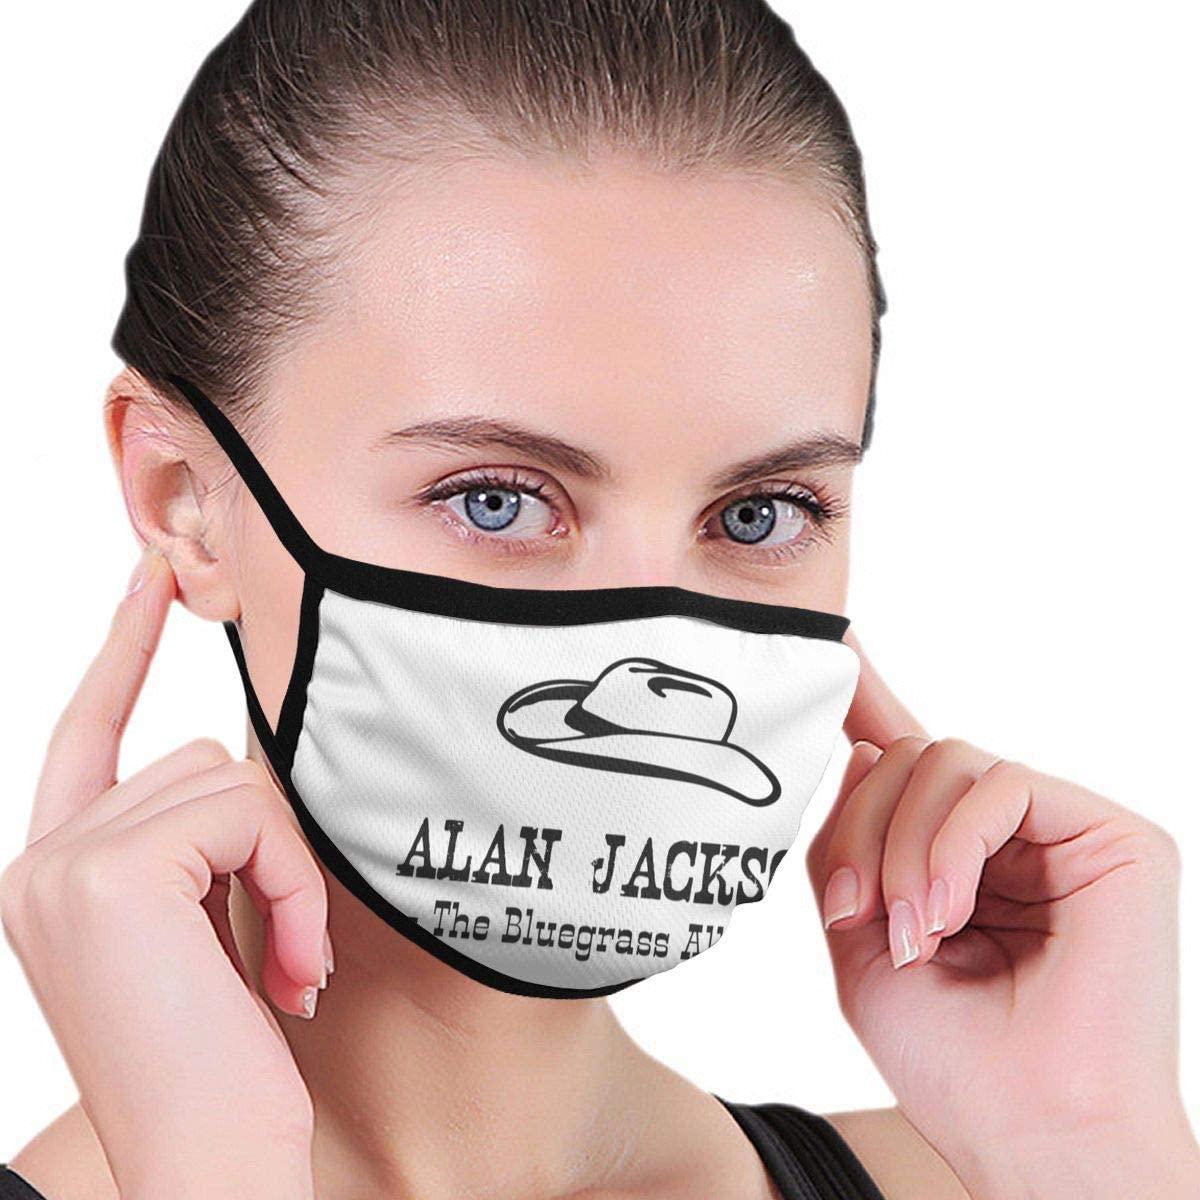 Qwtykeertyi Alan Jackson Fashion Protective Reusable Unisex Black Cotton Washable Balaclava